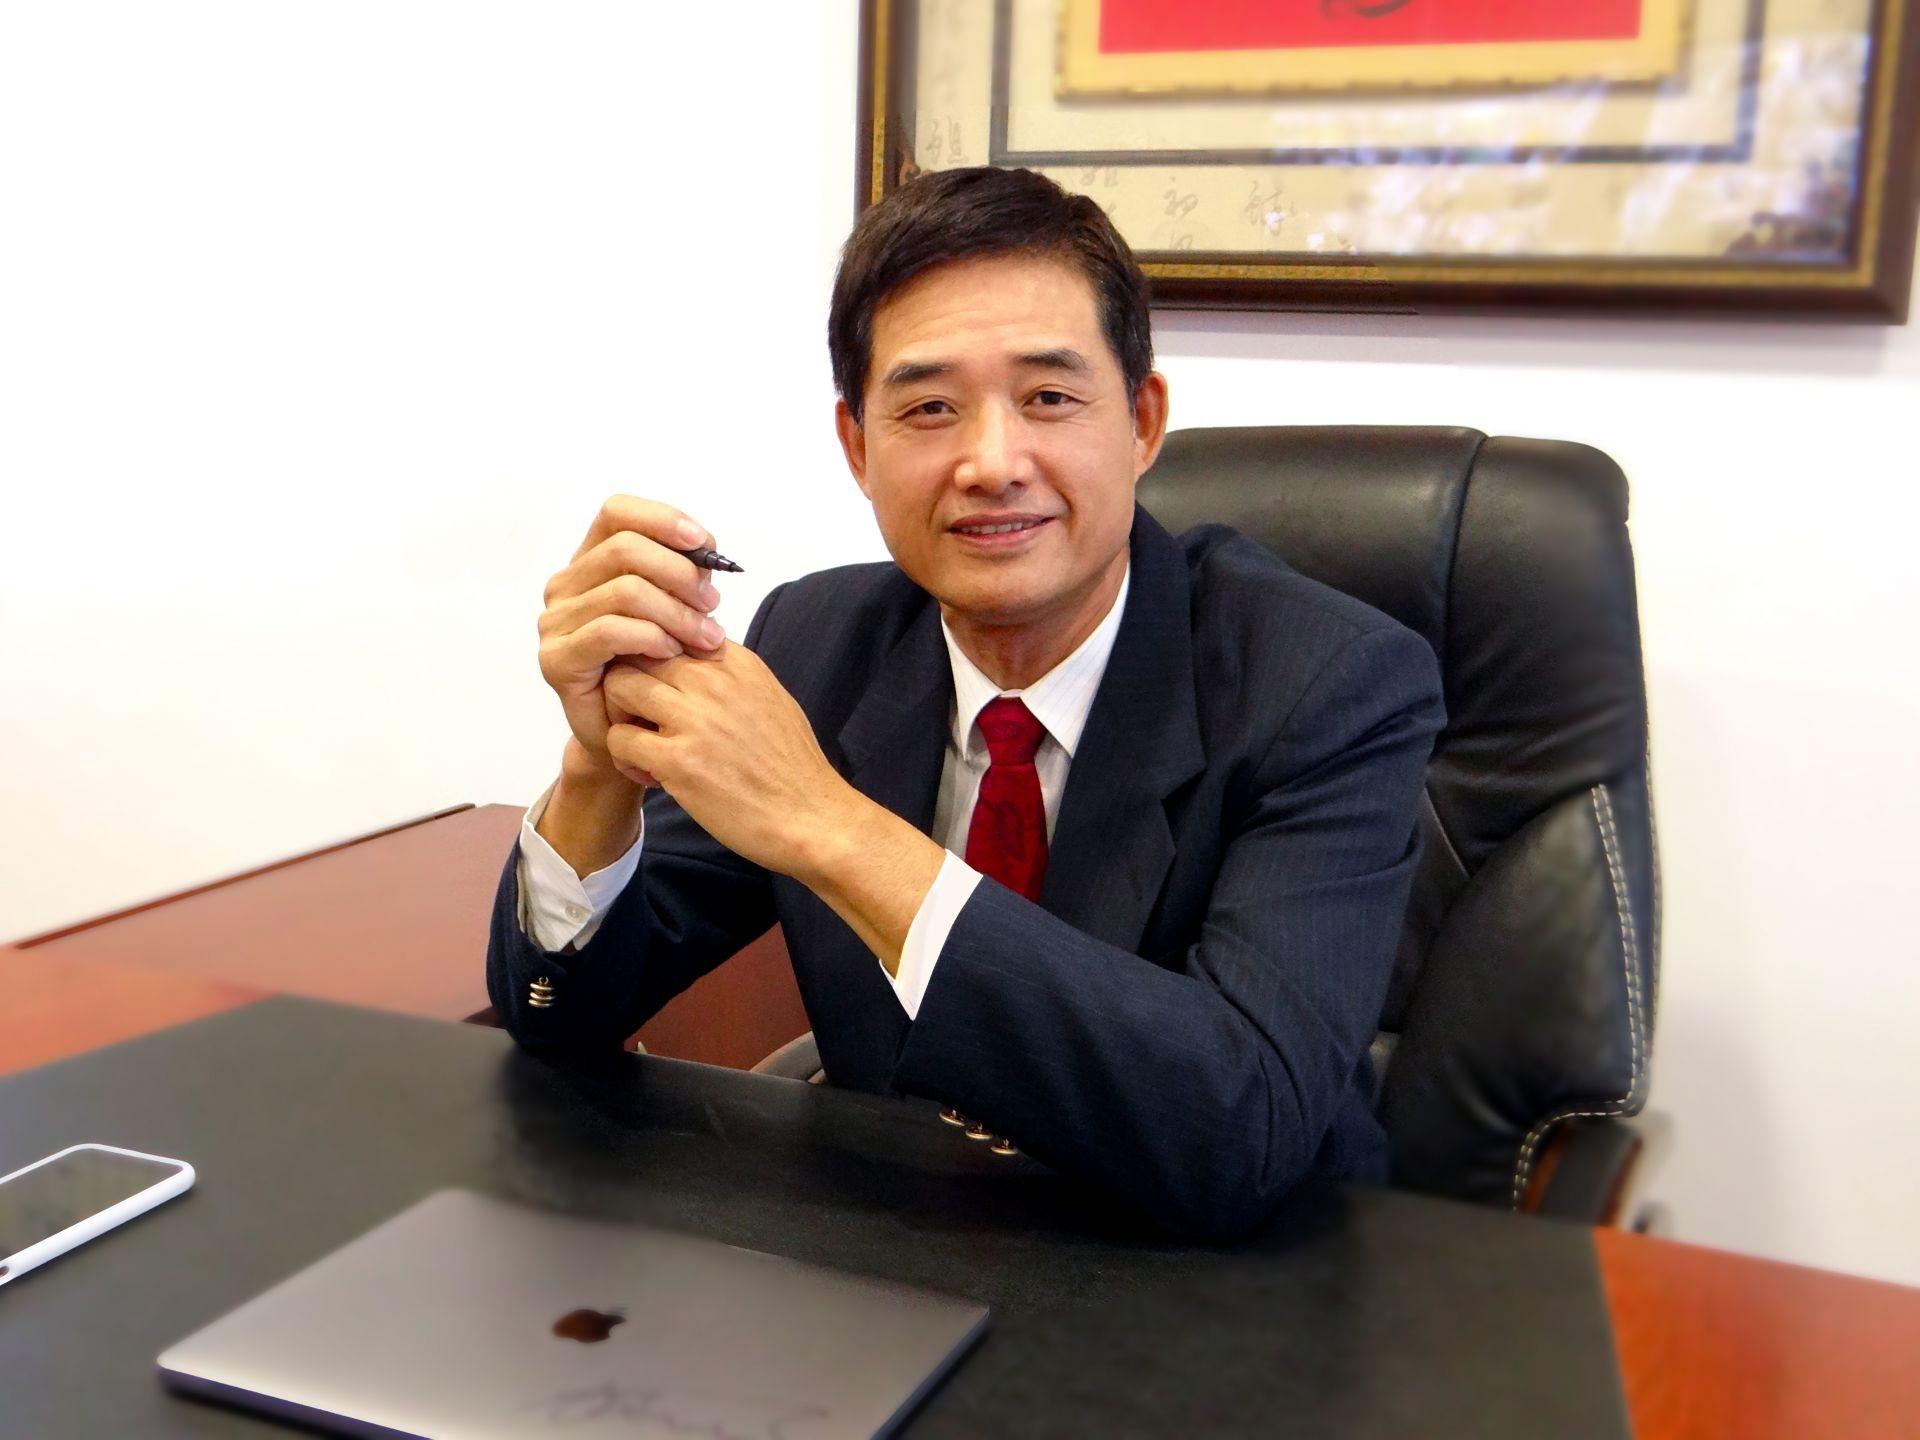 profil firmy - Brian Cheng, CEO Yung Soon Lih .